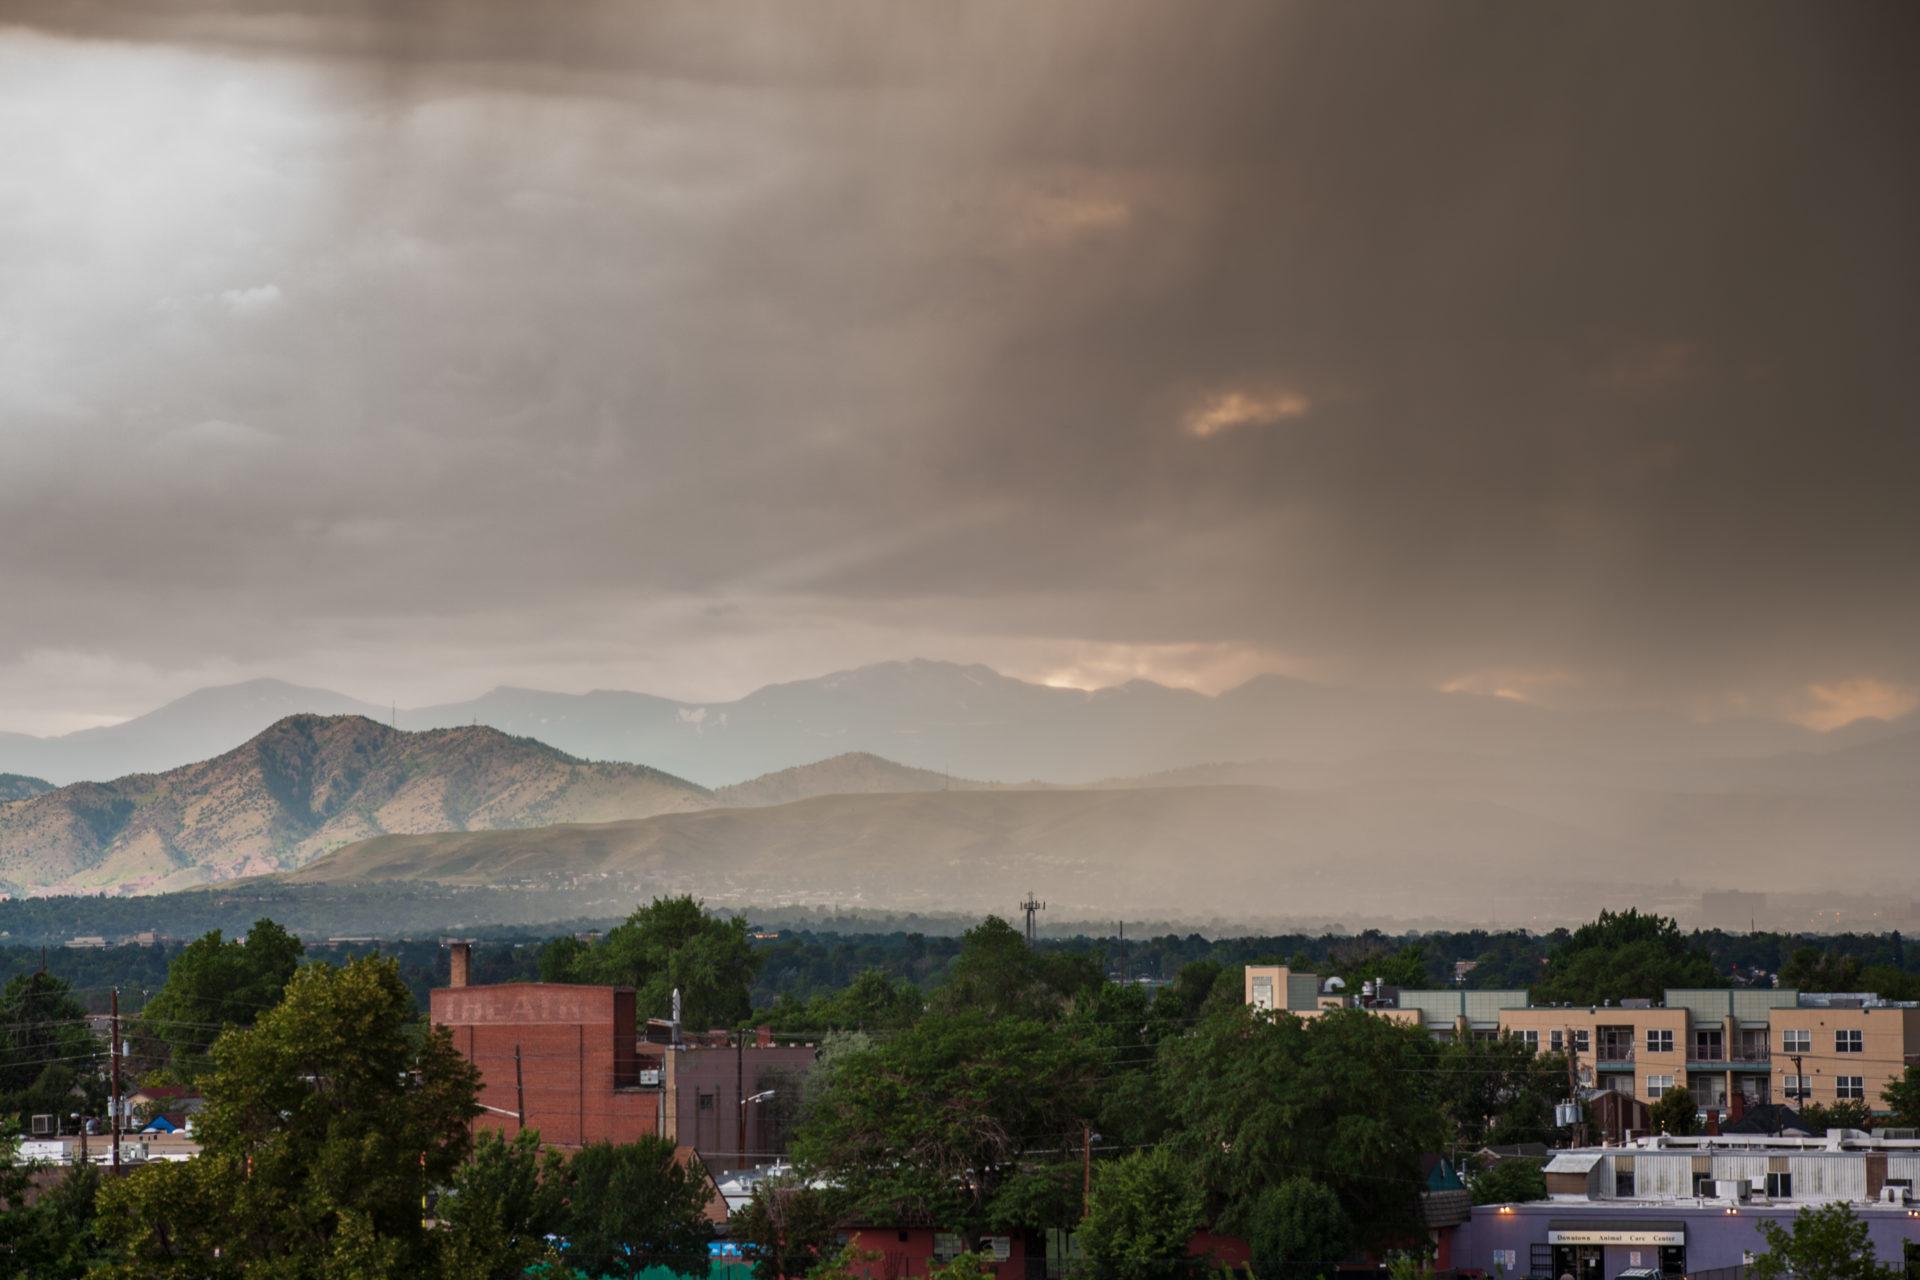 Mount Evans afternoon storm - July 27, 2011